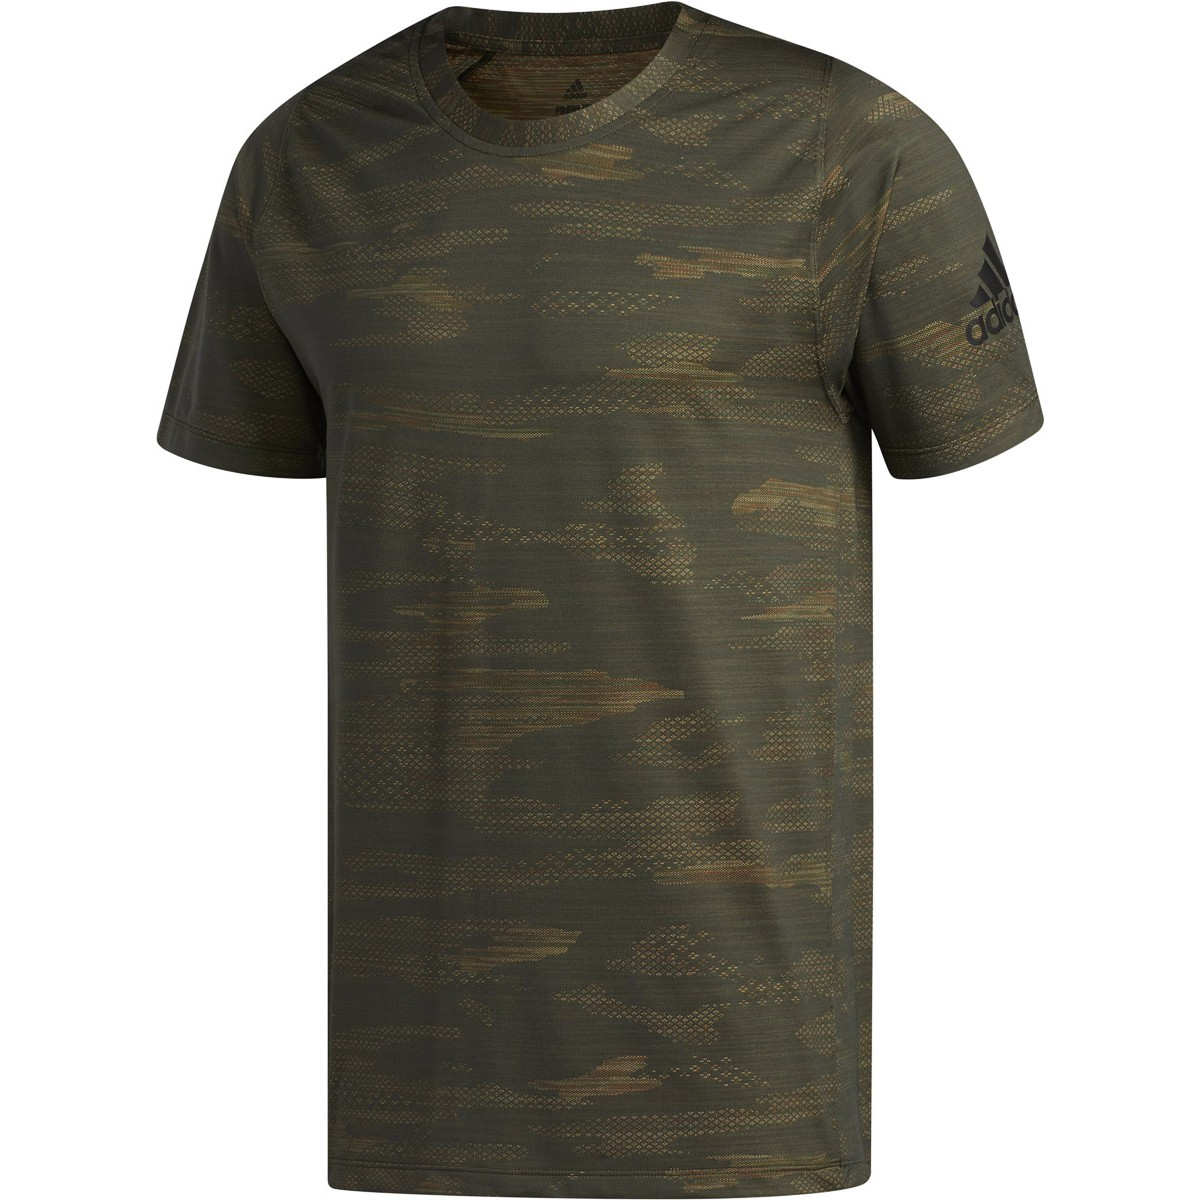 adidas shirt camo